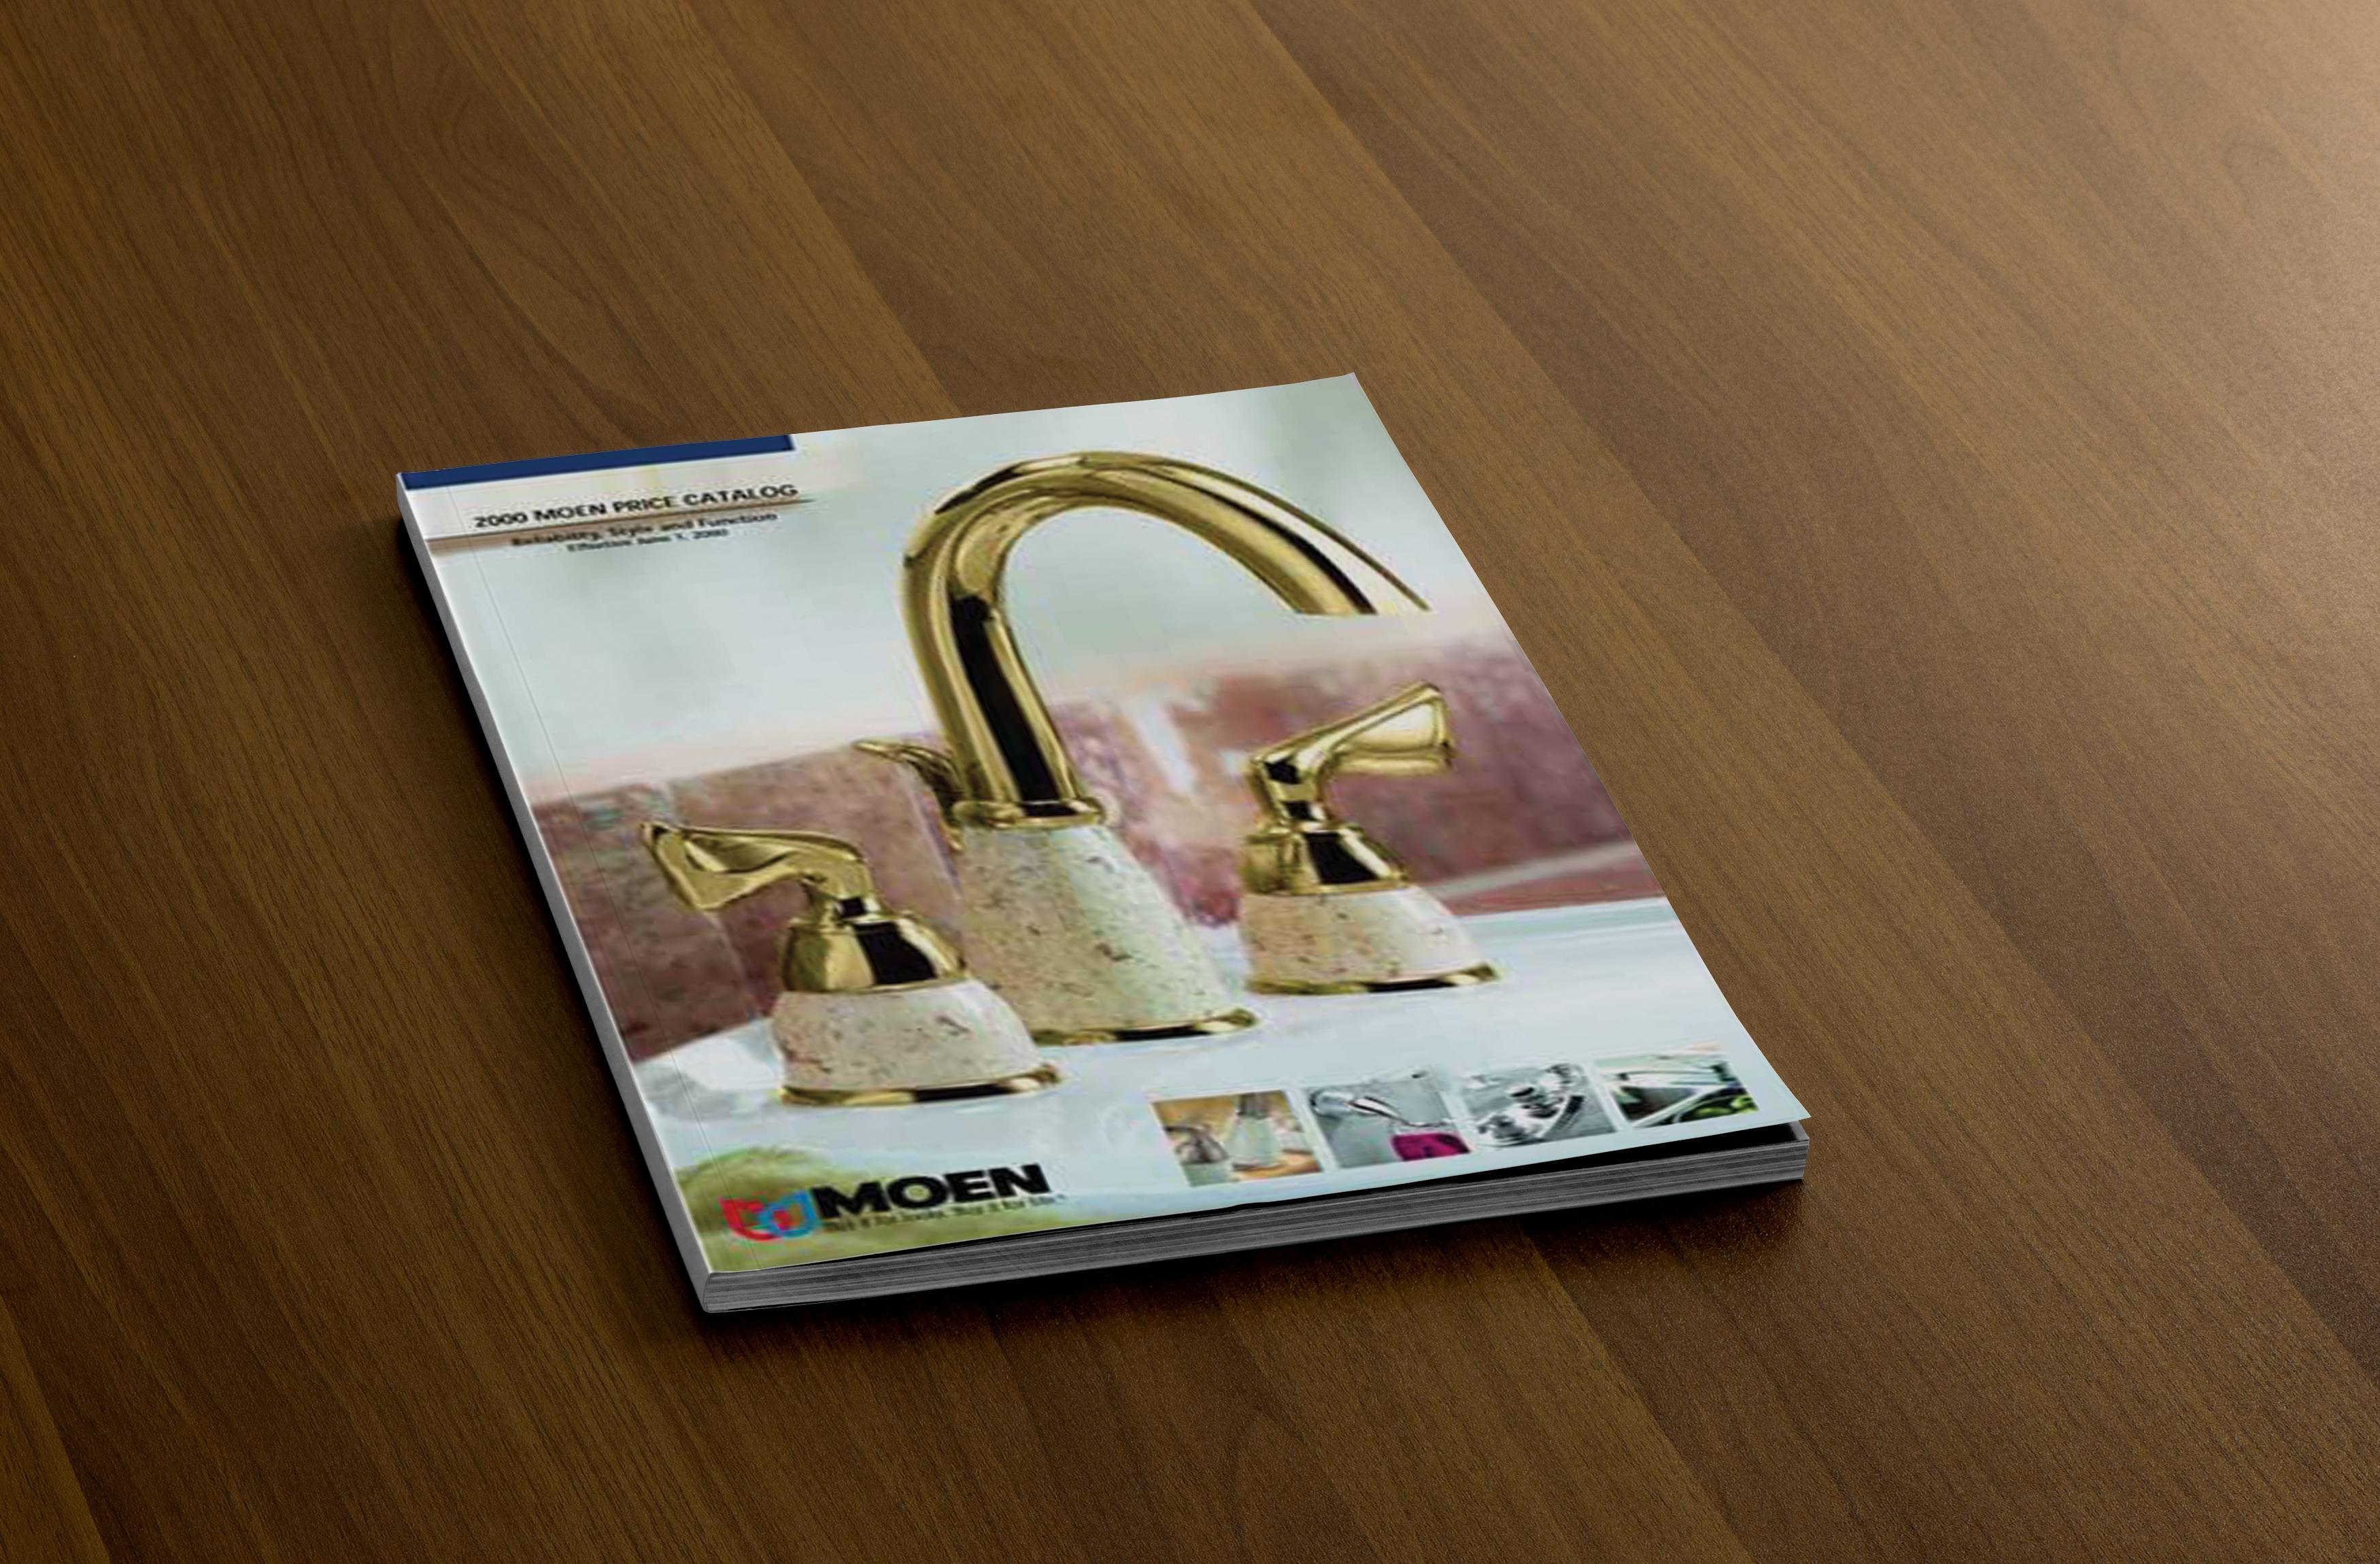 Moen Product Catalog